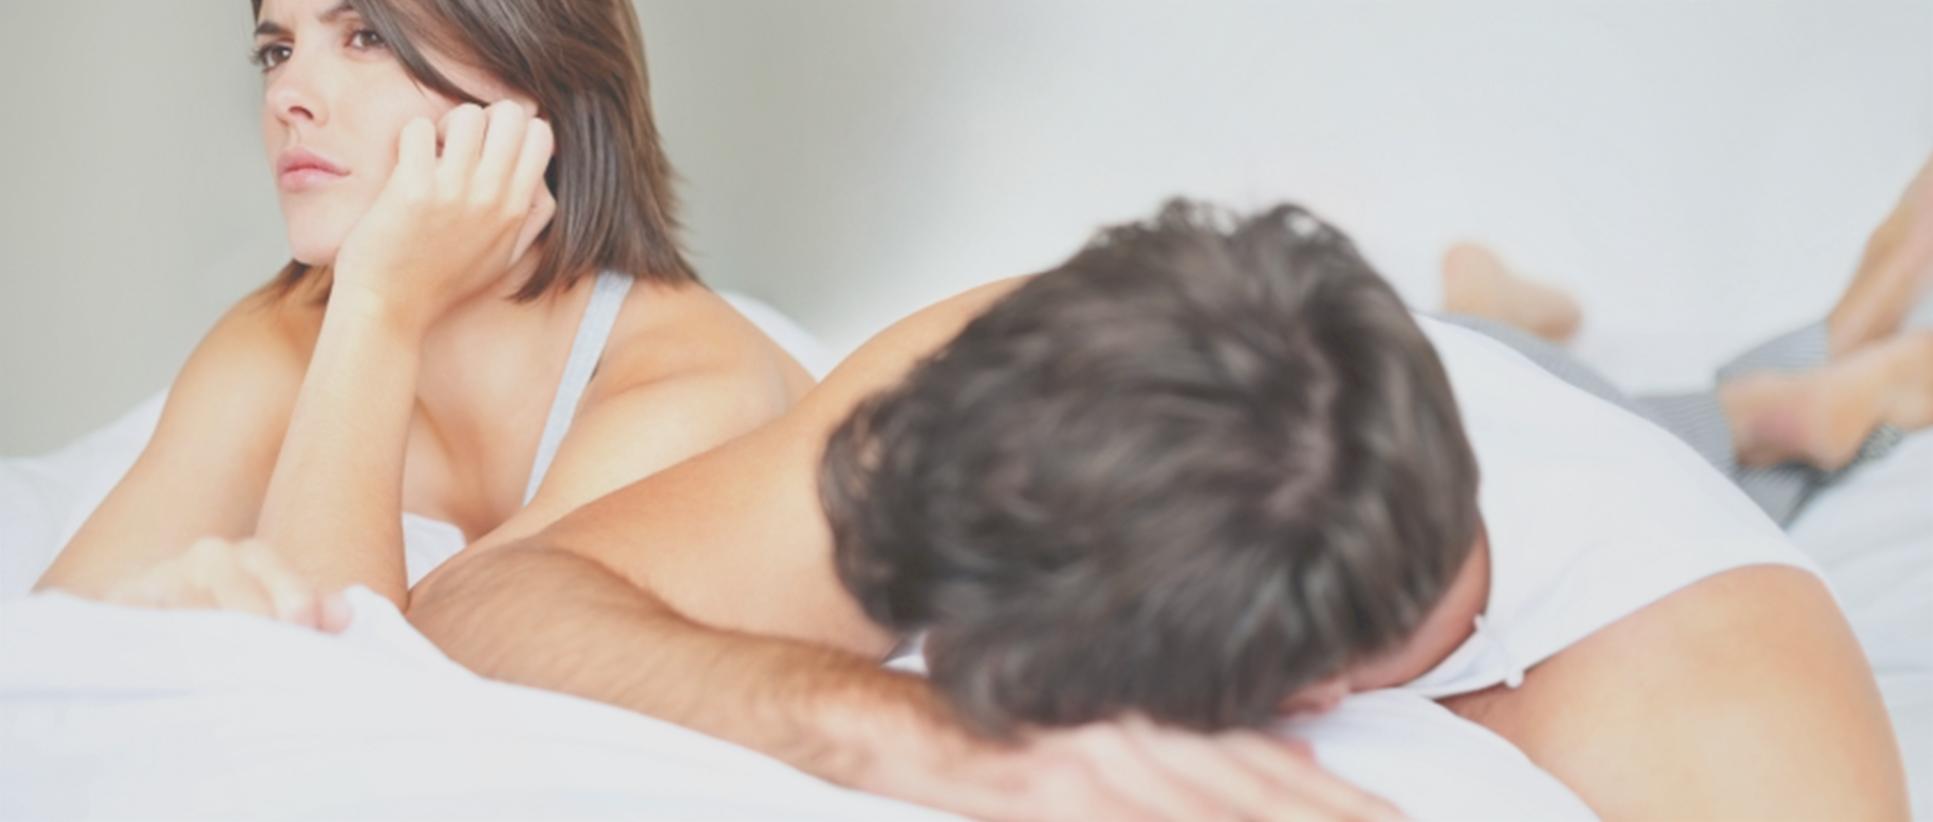 orgasmo múltiplo masculino